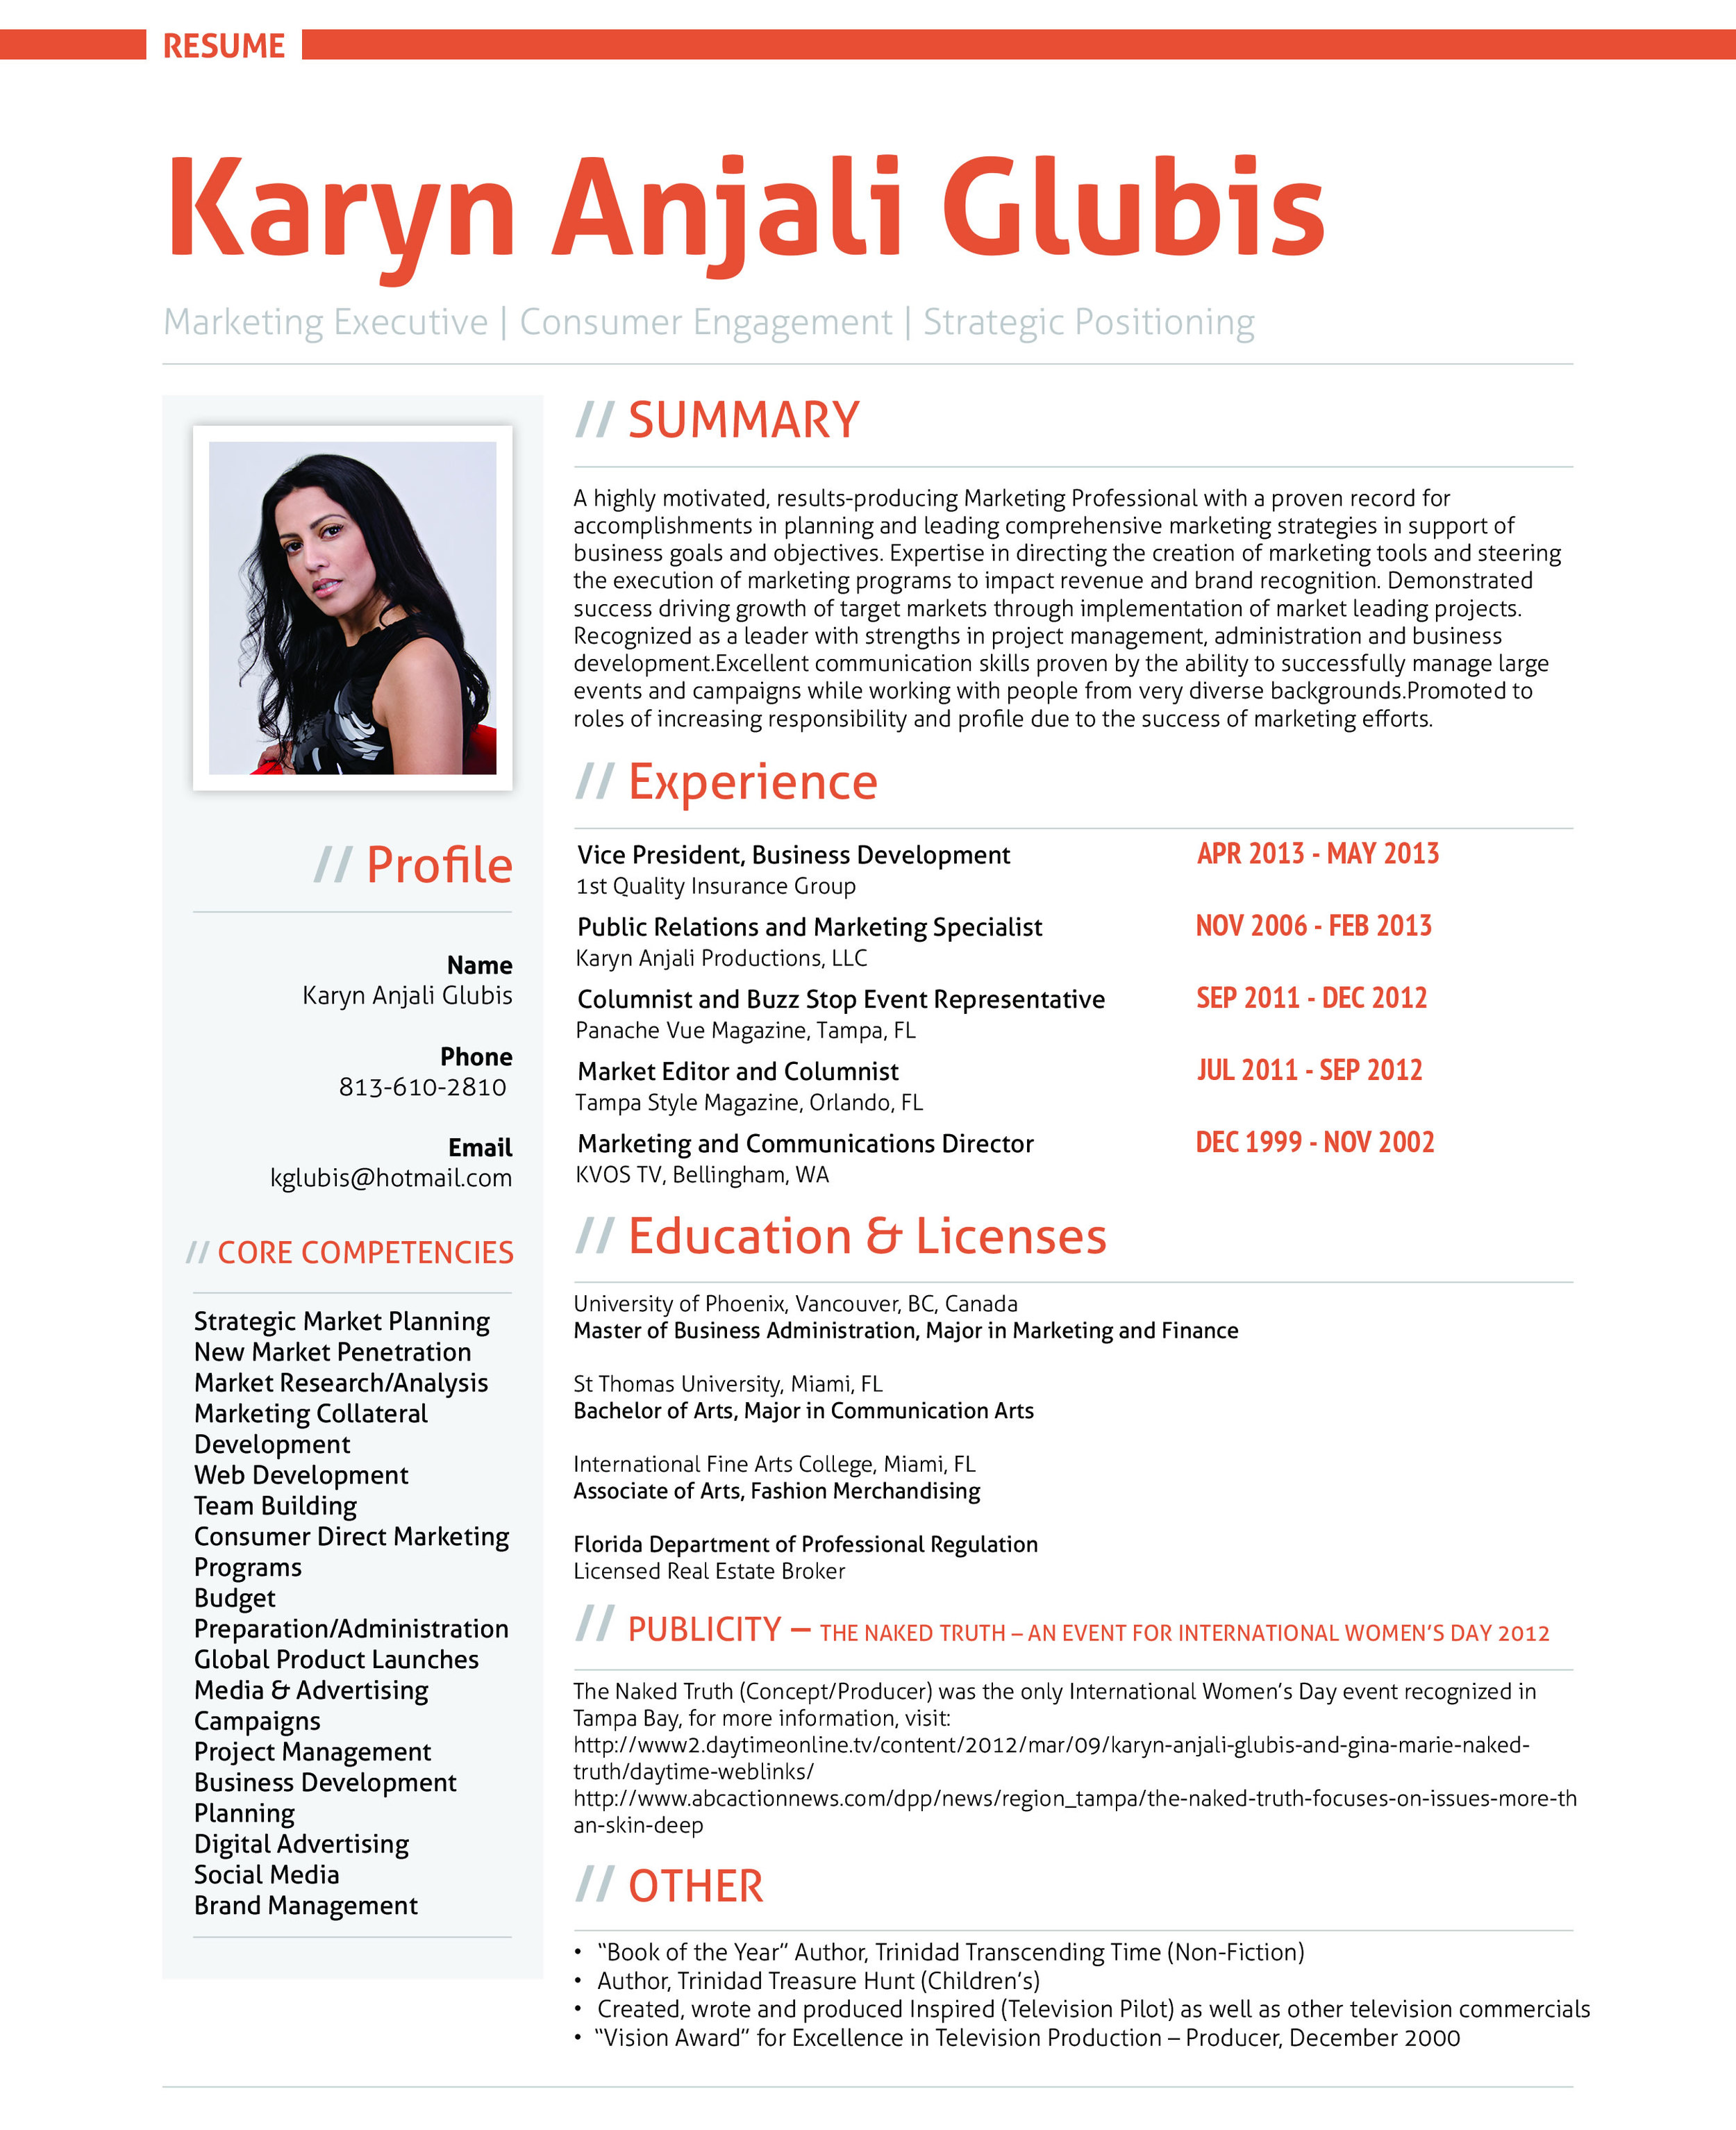 Karyn Glubis Resume.jpg